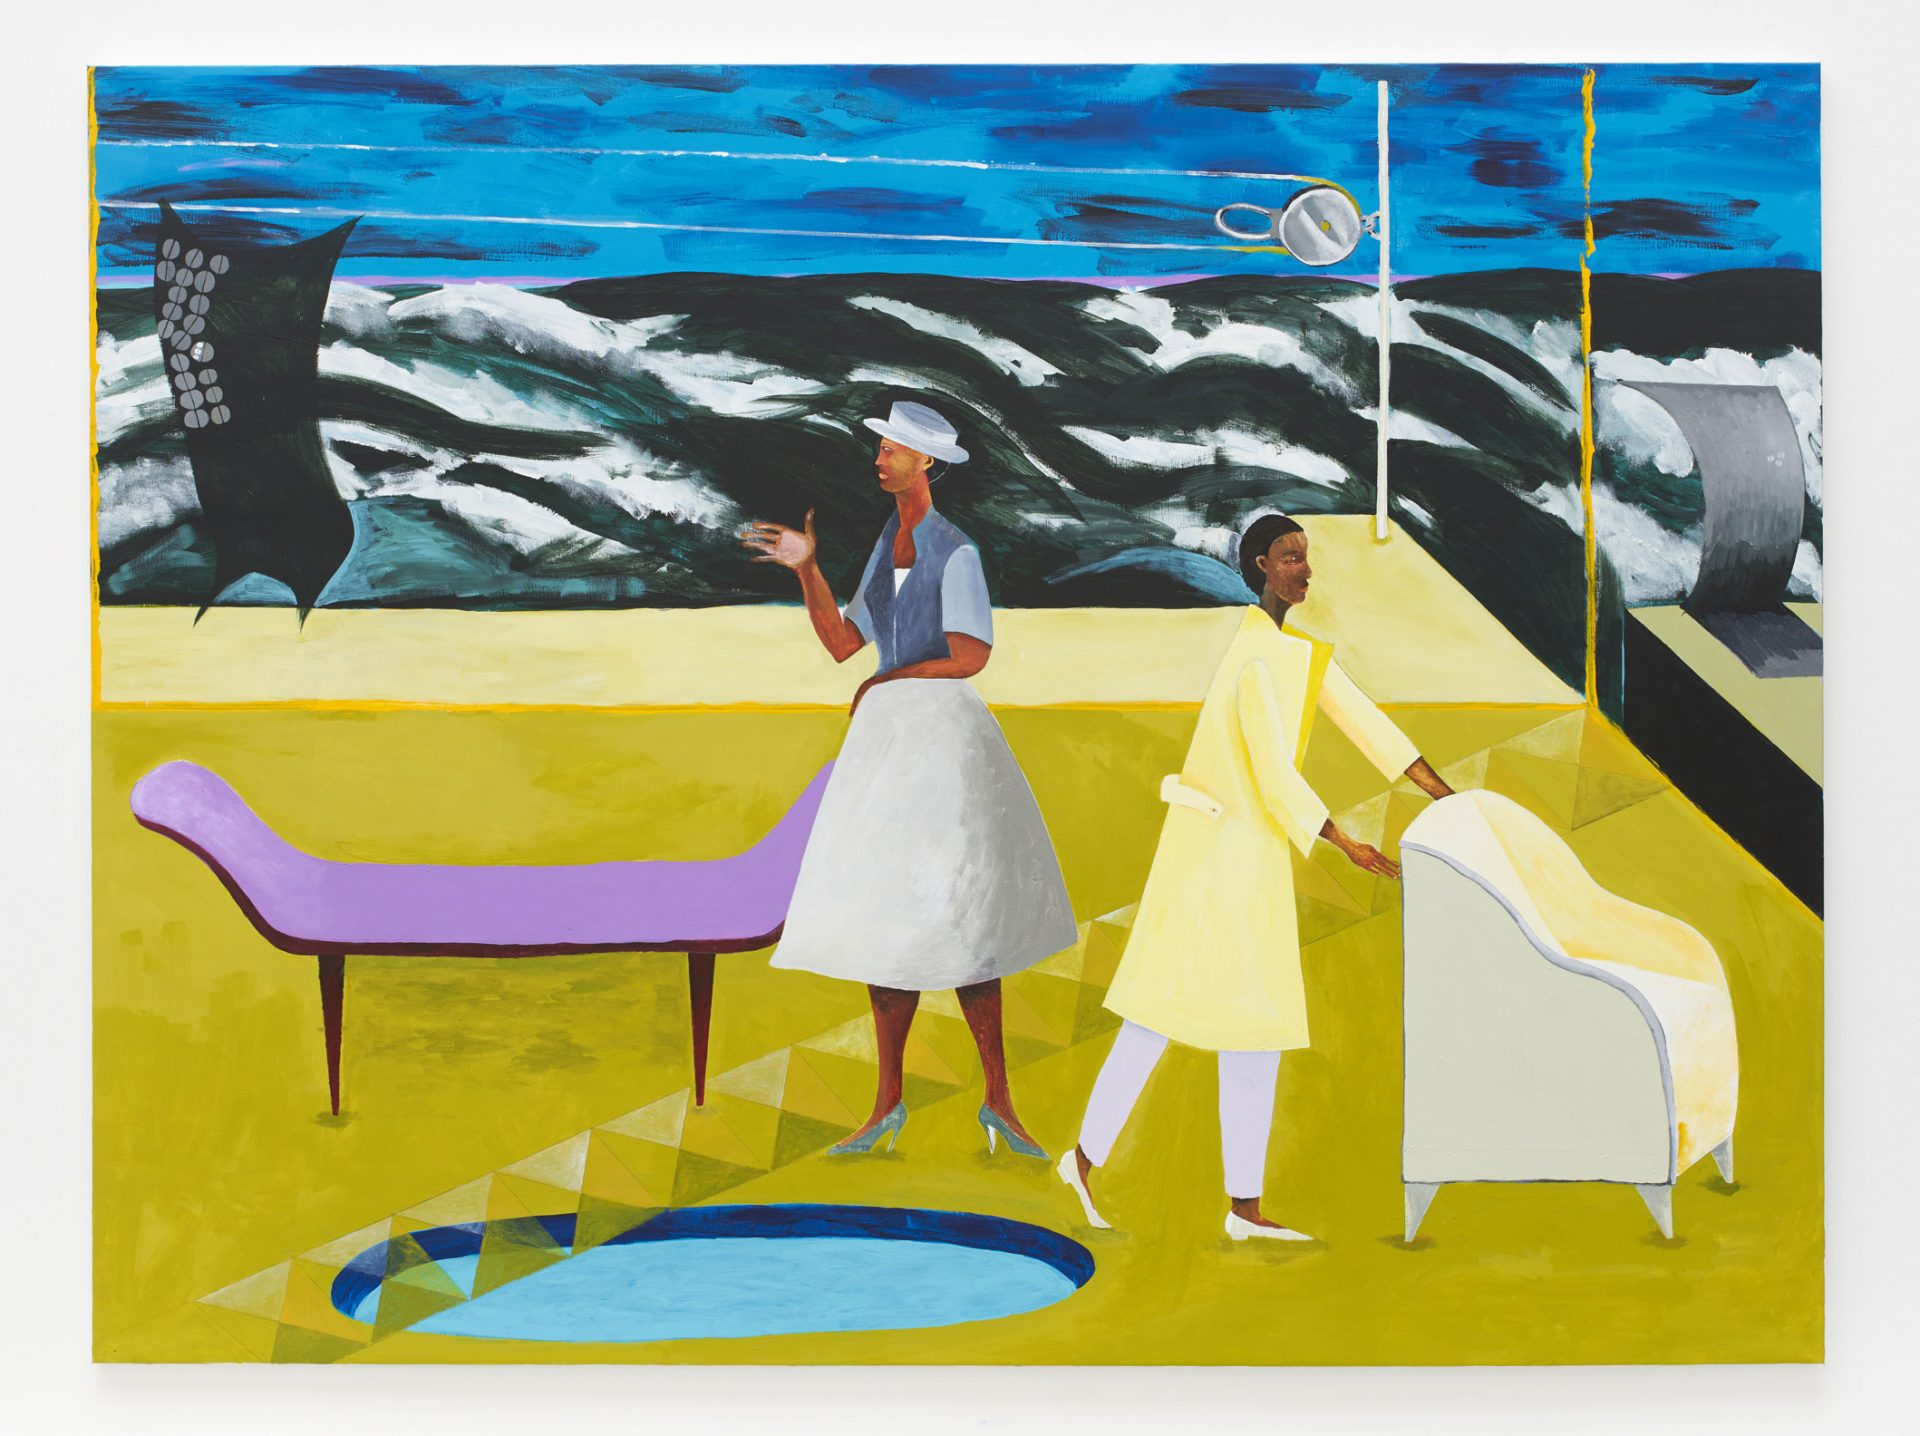 Lubaina Himid, 'Lubaina Himid', Tate Modern, 25 November 2021 – 3 July 2022